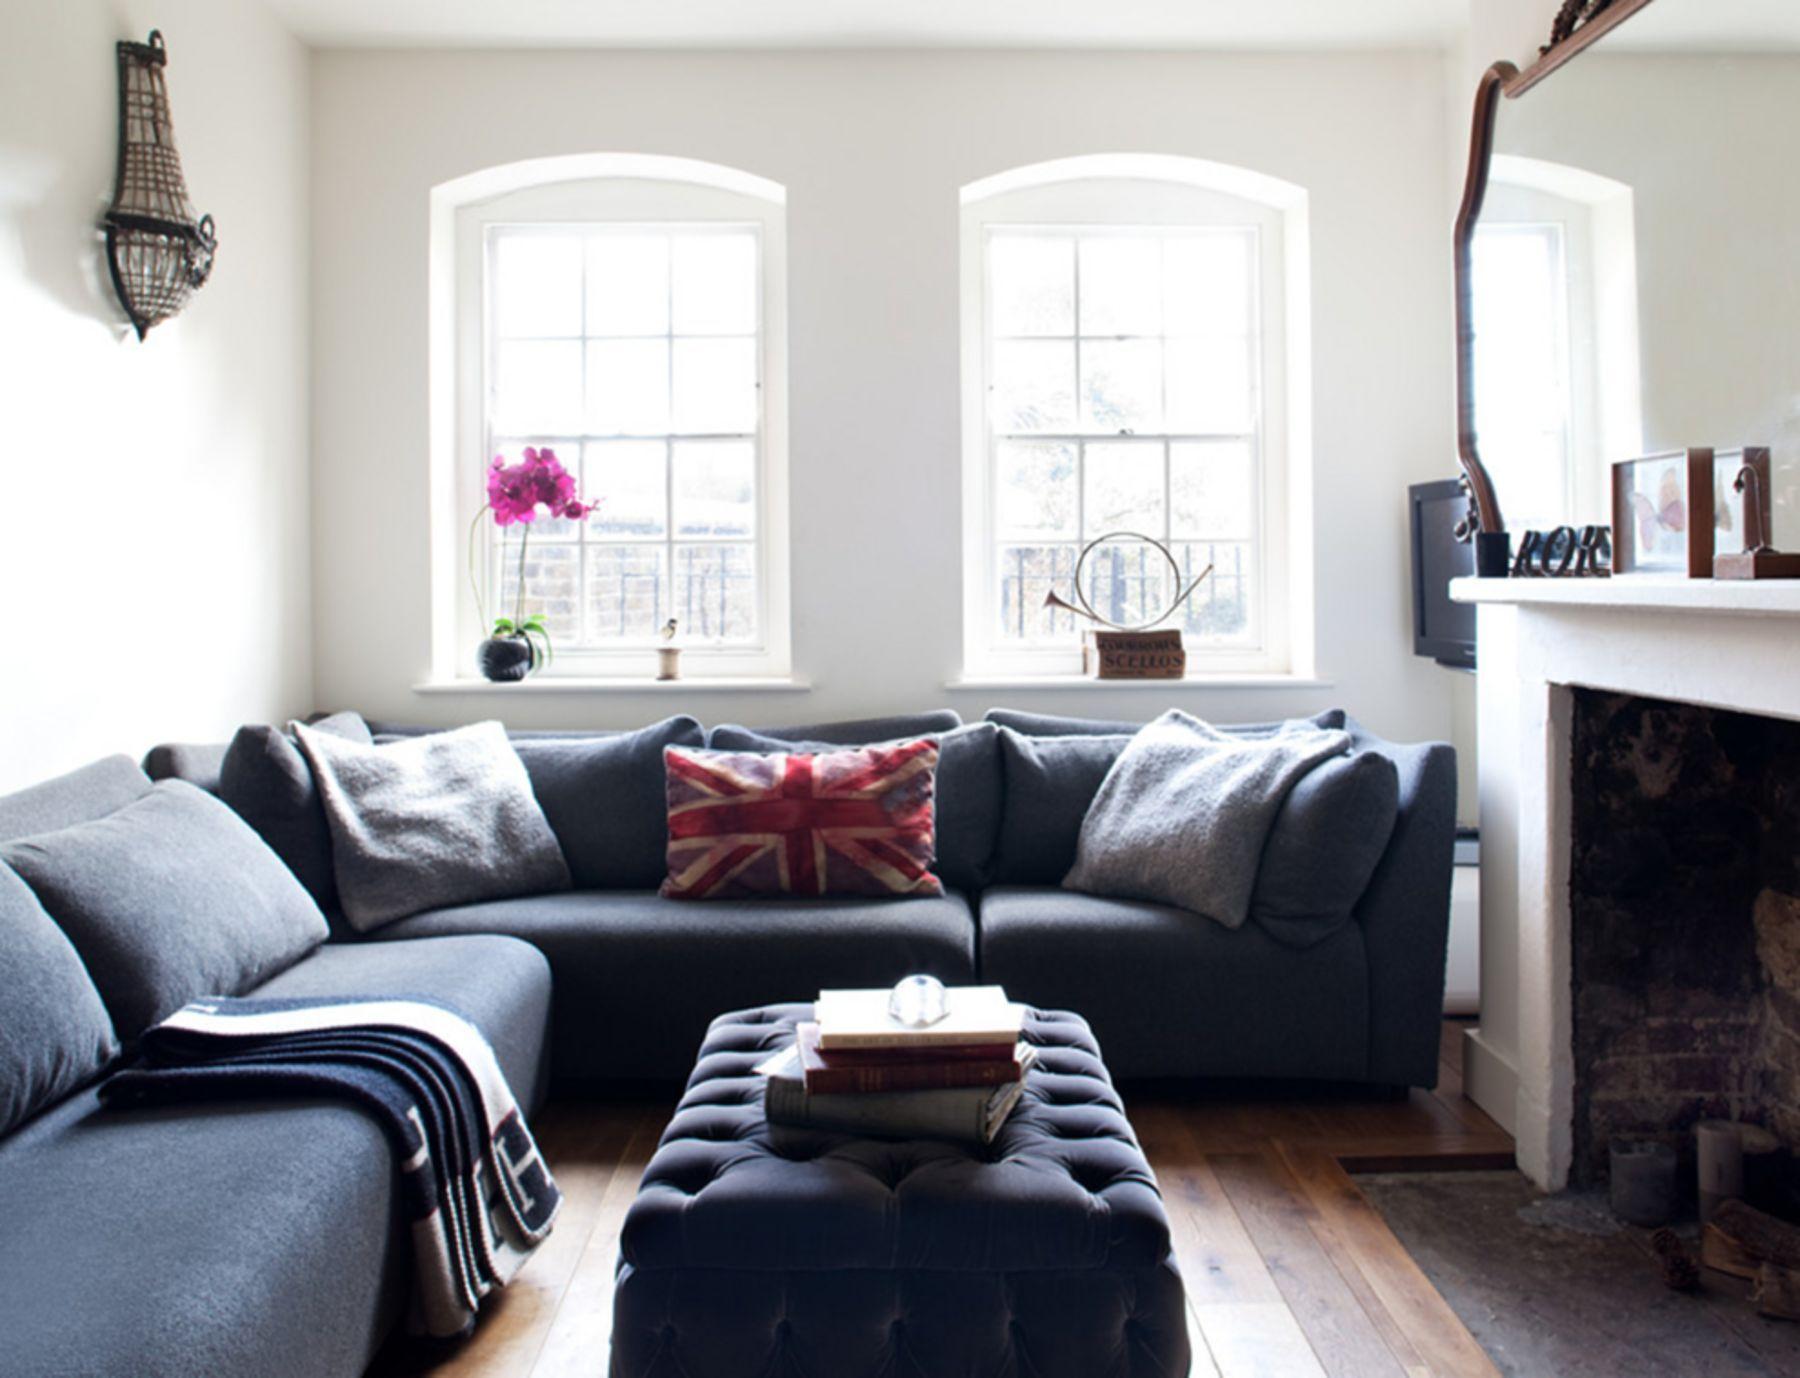 Pin By Lizavioletta On Furniture Design Ideas In 2019 Small Living Room Design Small Living Rooms Living Room Designs